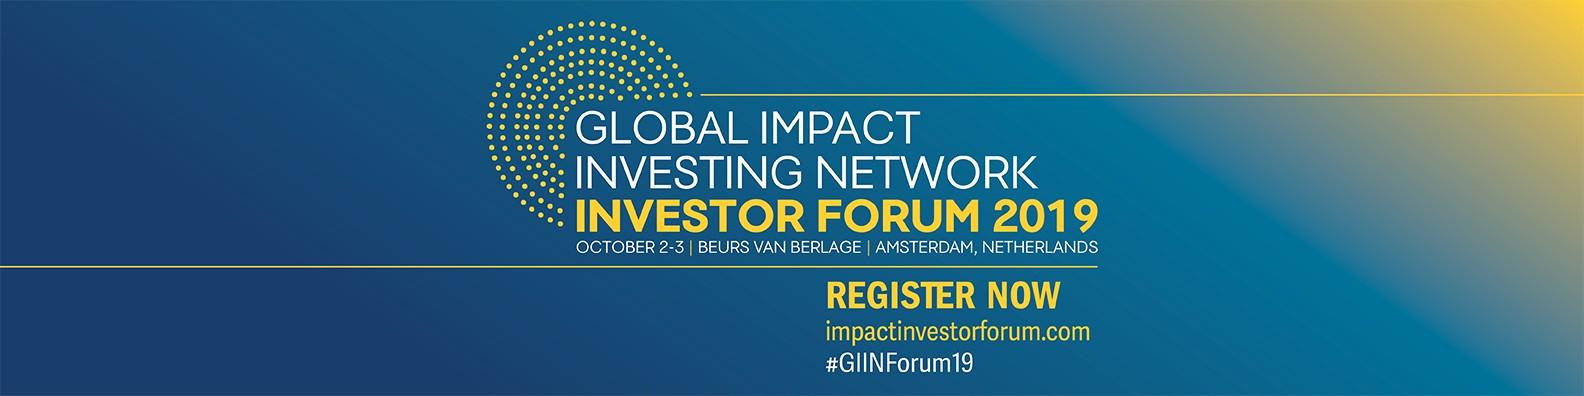 The Global Impact Investing Network | LinkedIn